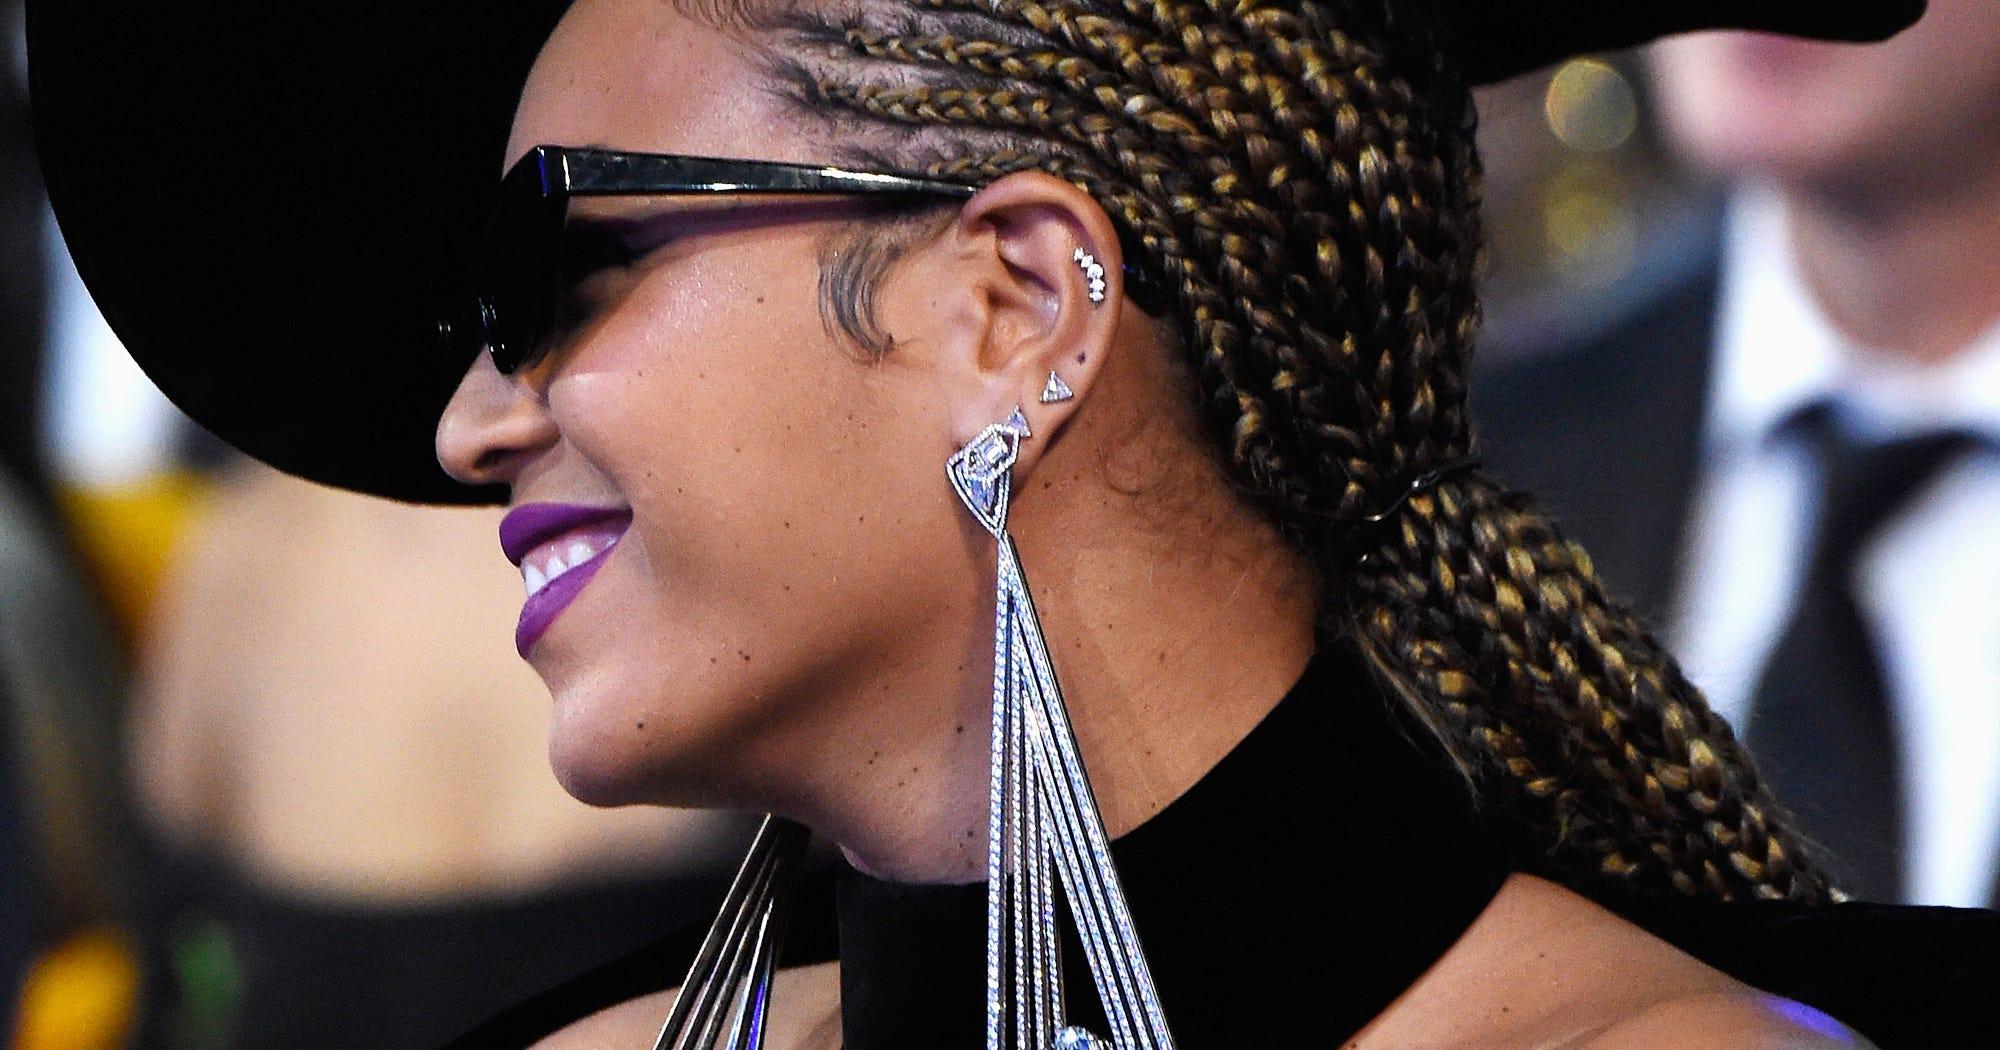 Celebrities With Multiple Ear Piercings Trend